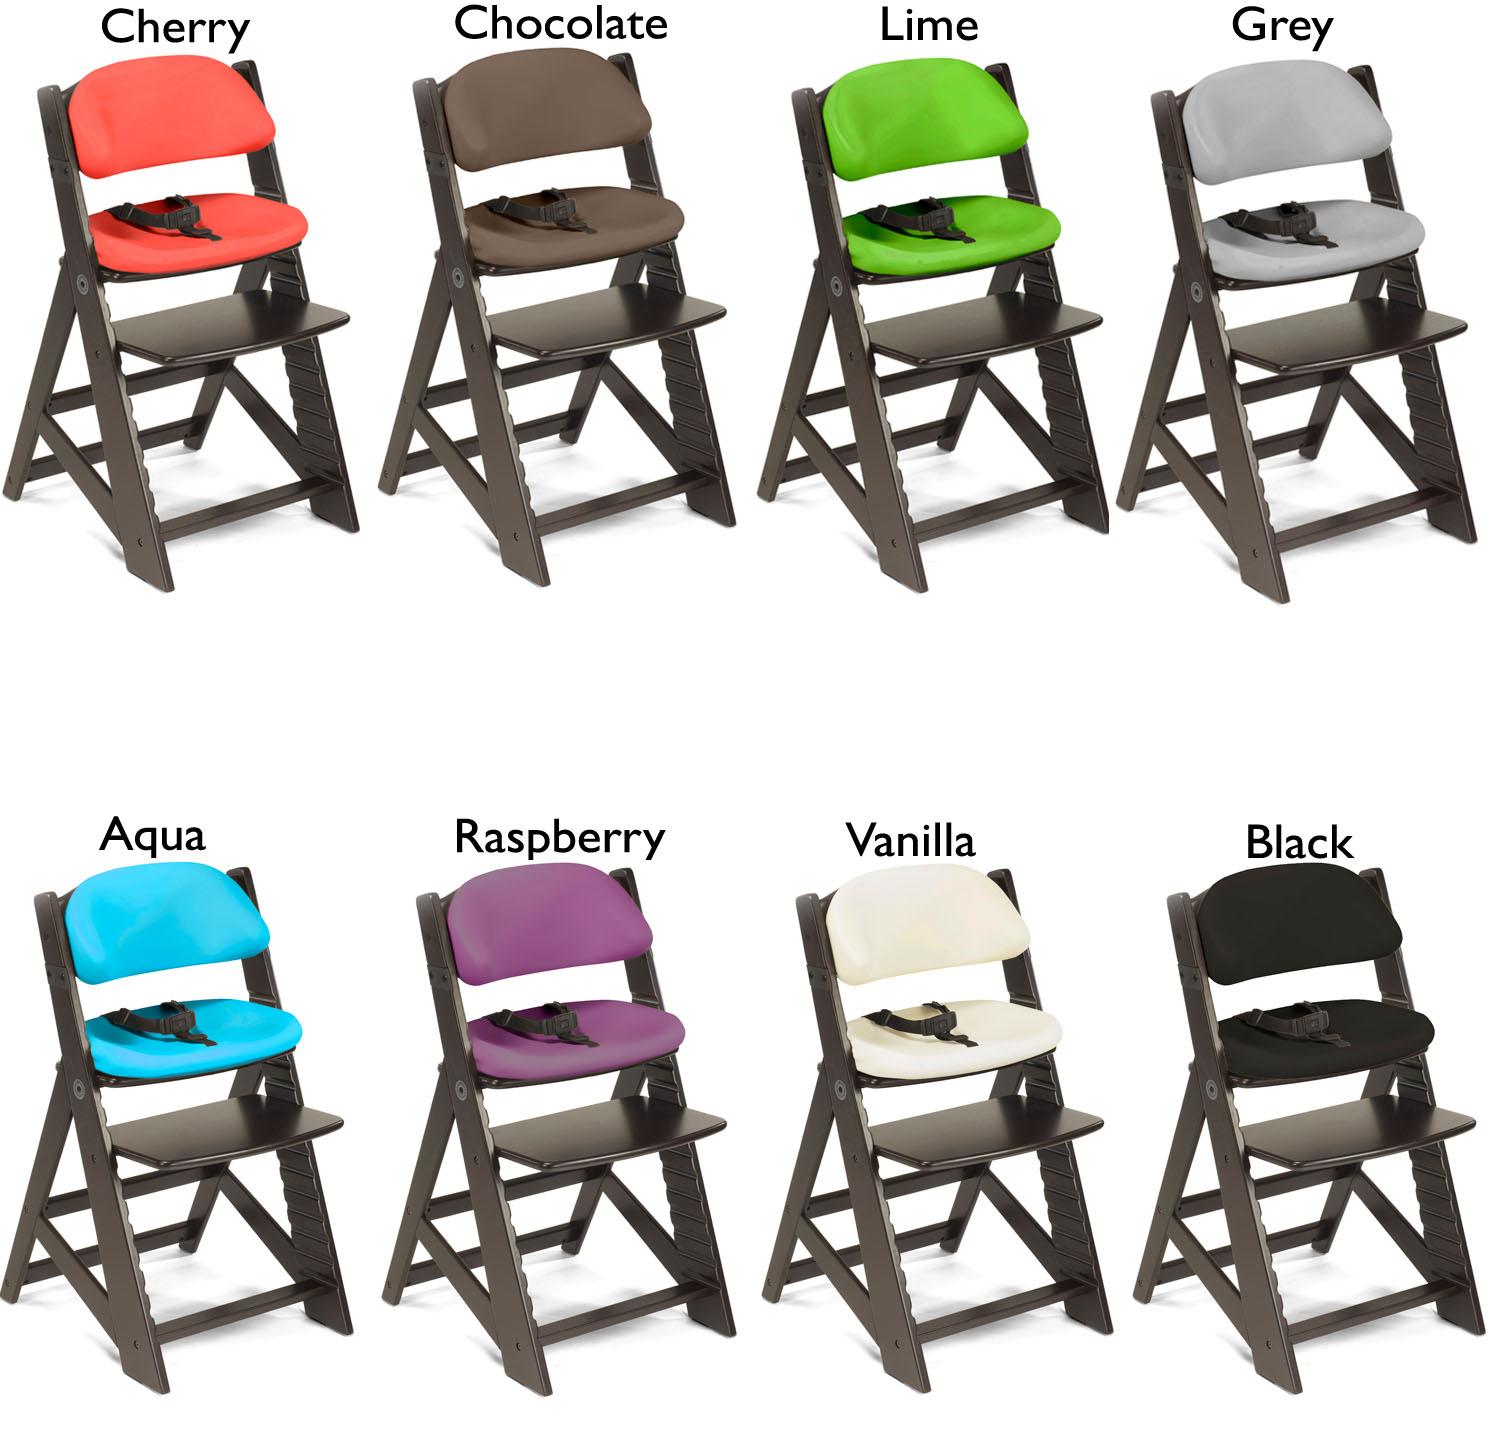 keekaroo high chair diy lawn covers best of rtty1